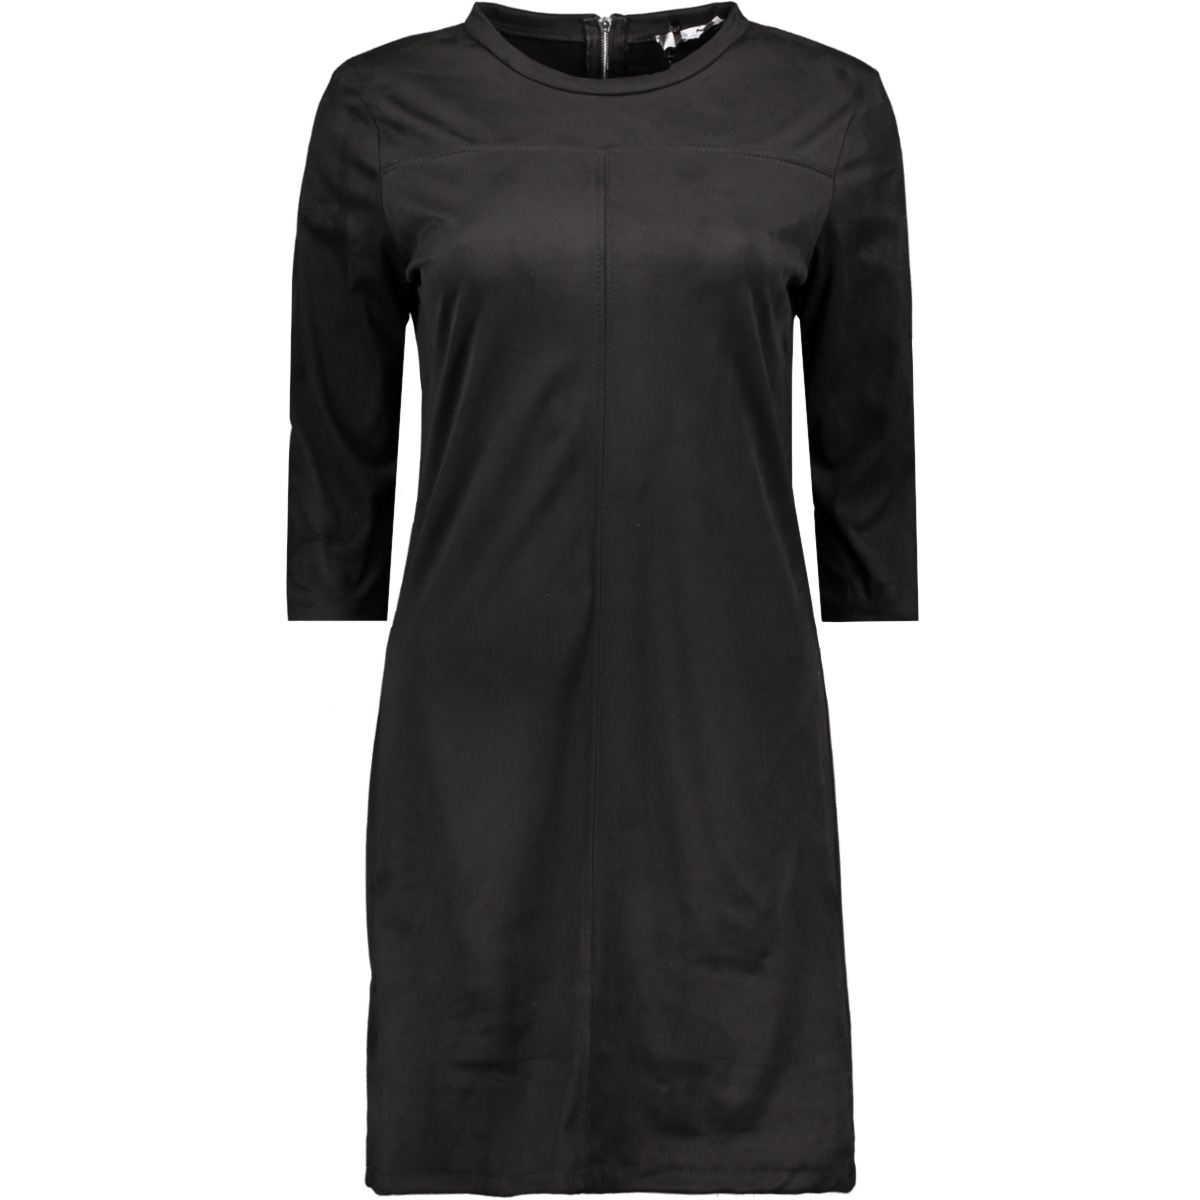 8353 britty dress luba jurk black